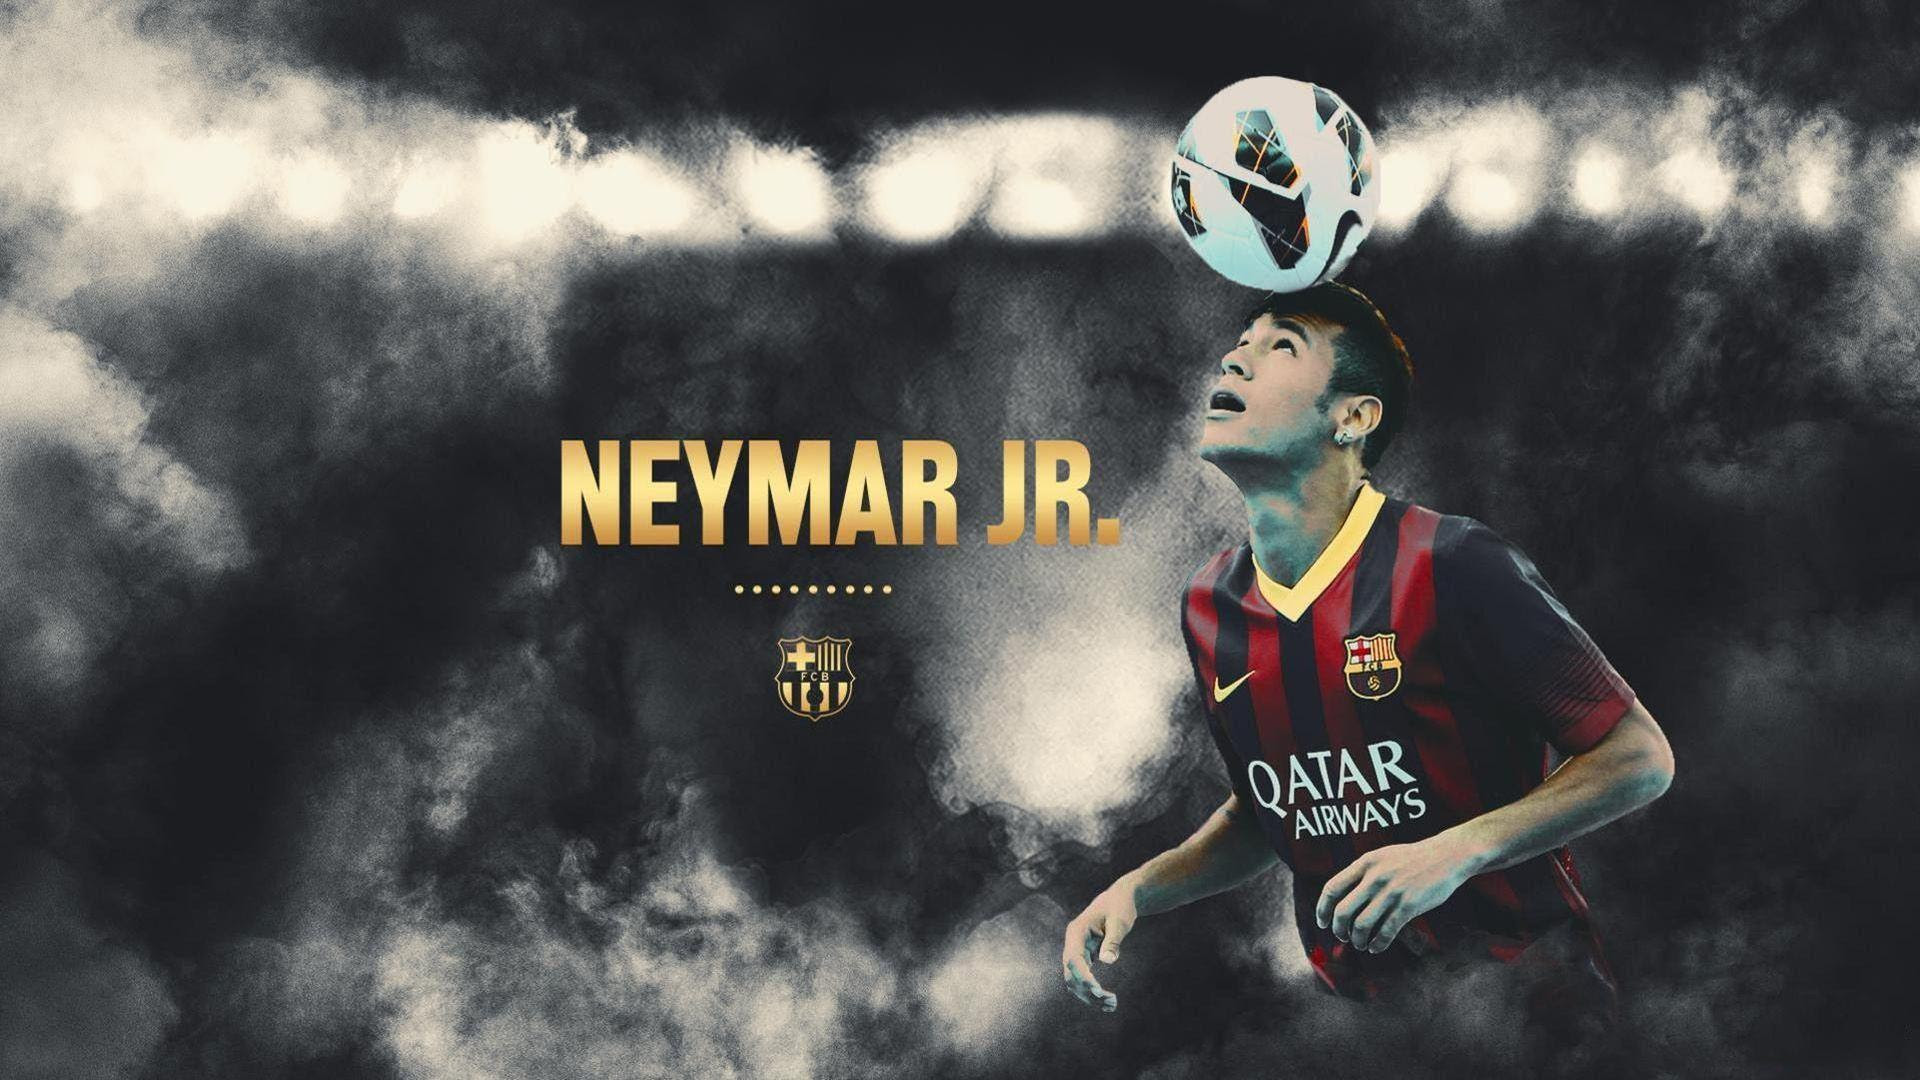 Neymar Wallpapers 2017 HD - Wallpaper Cave